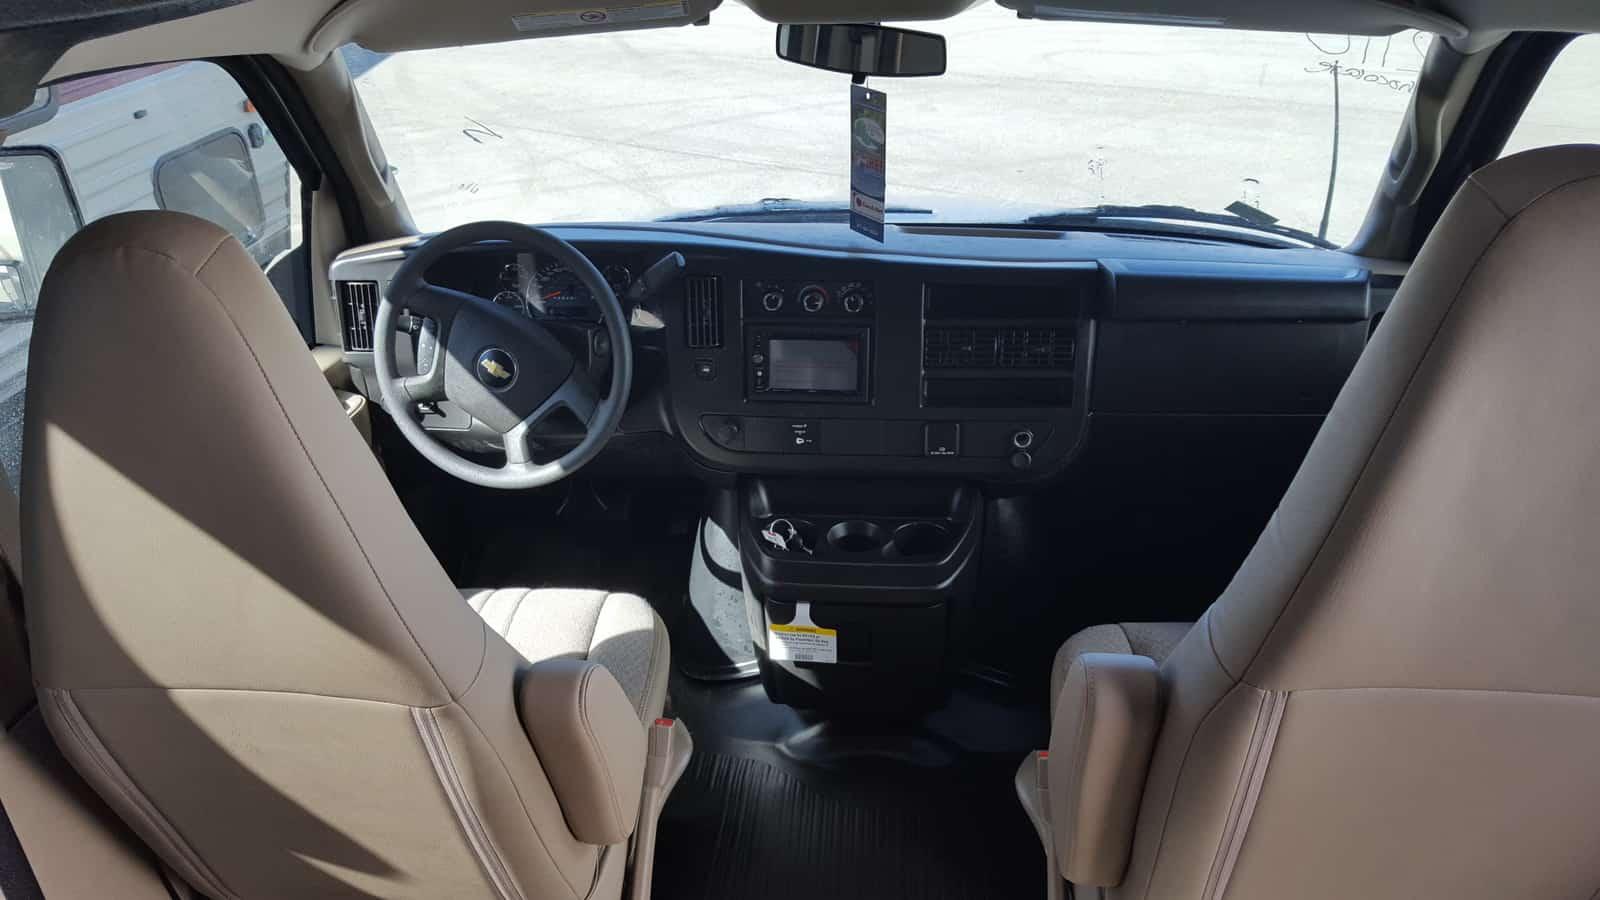 NEW 2018 Coachmen LEPRECHAUN 210RSC - American RV